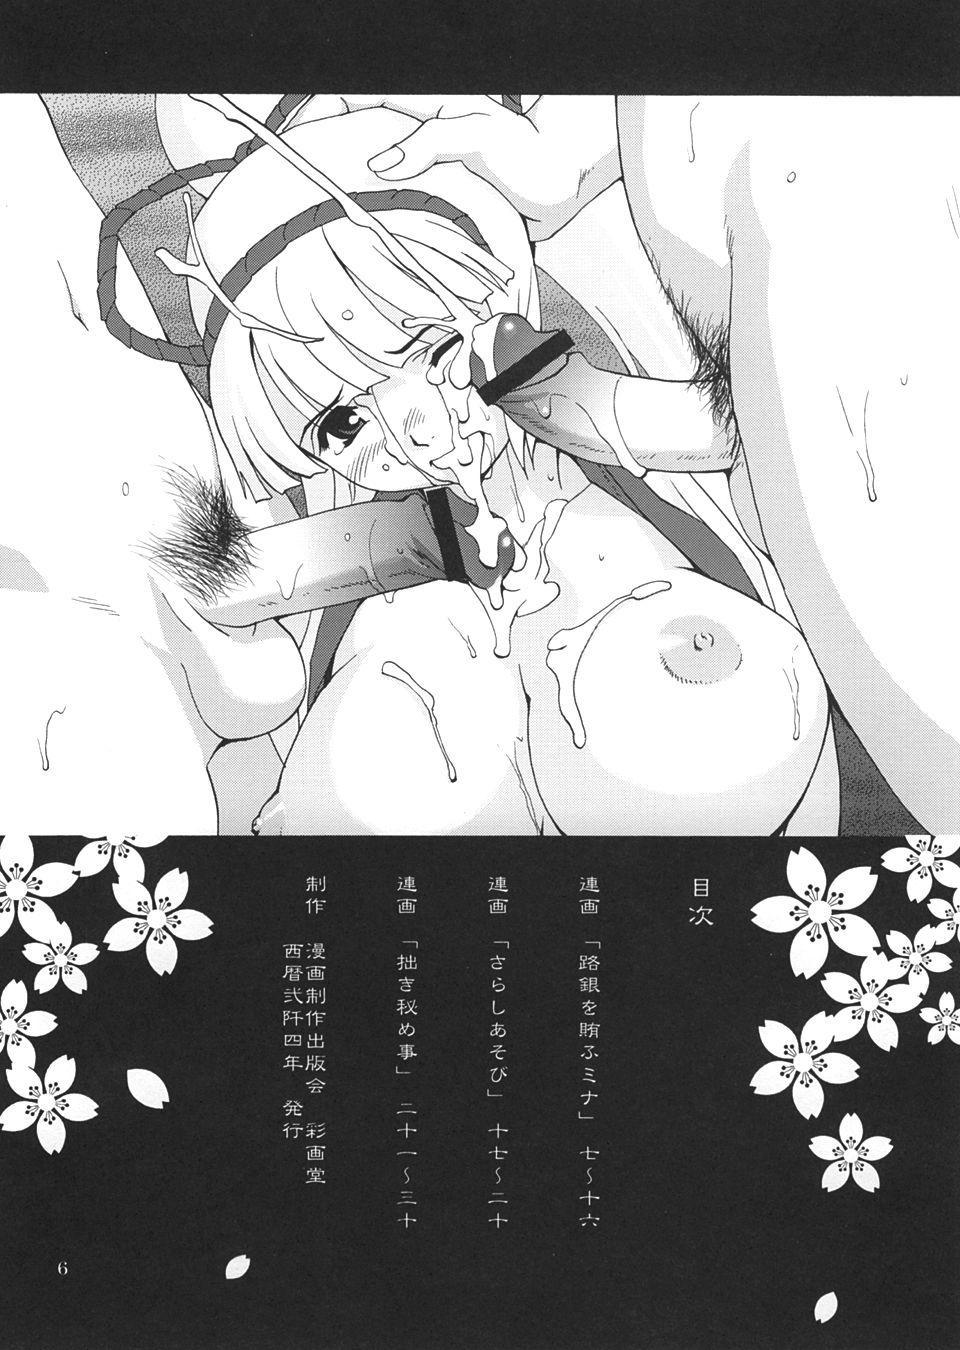 Sexual Samurais 4